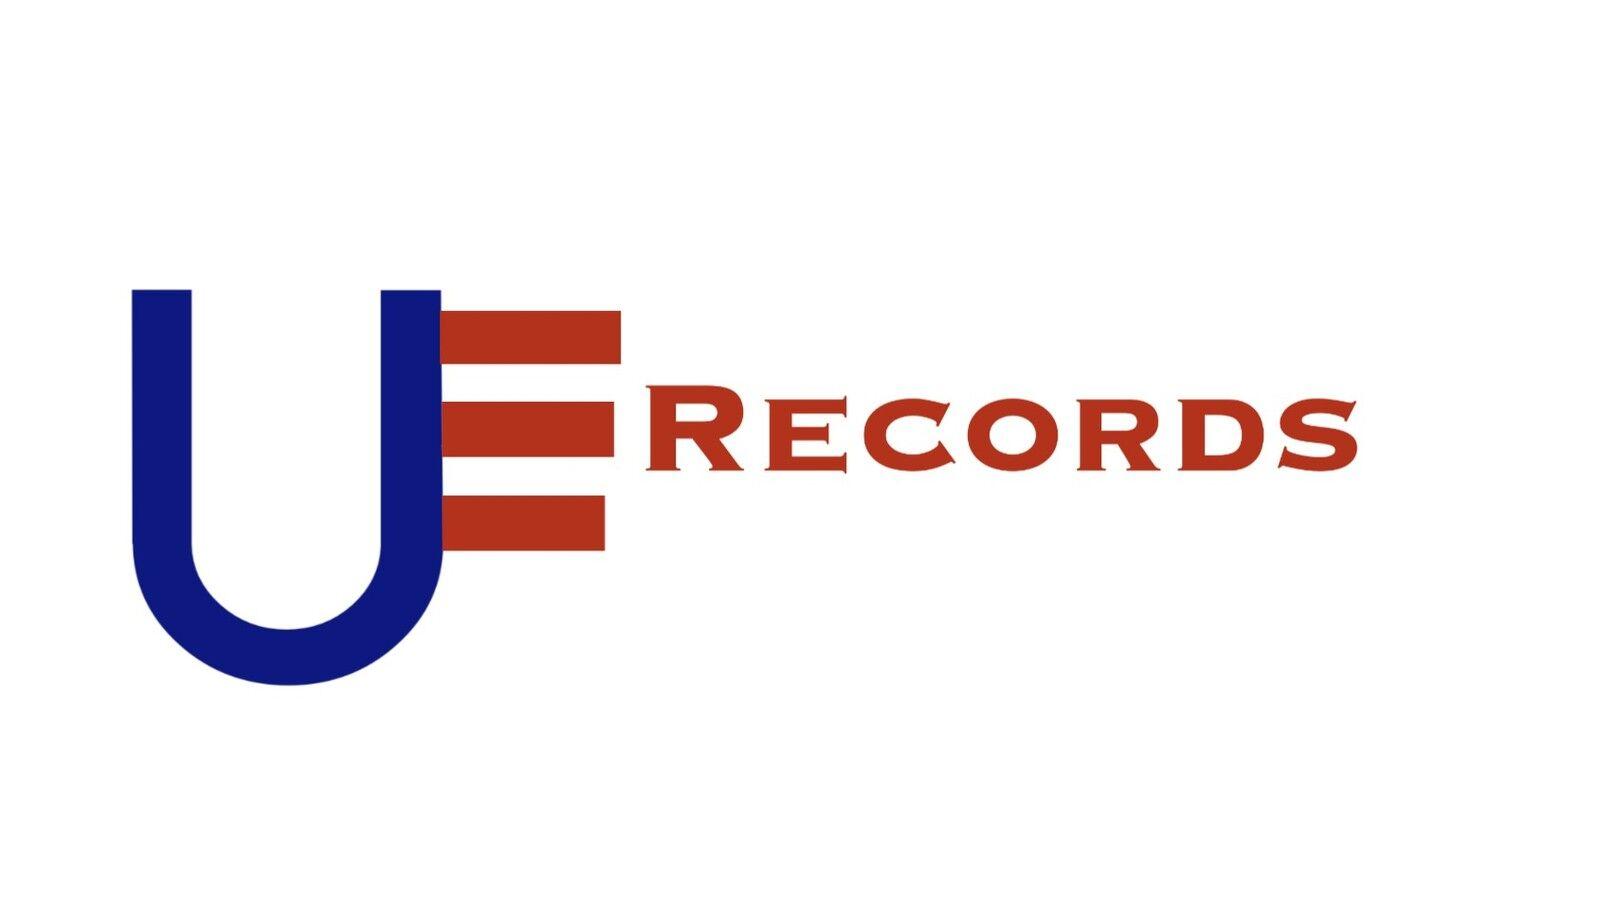 UNCLEVIL Records